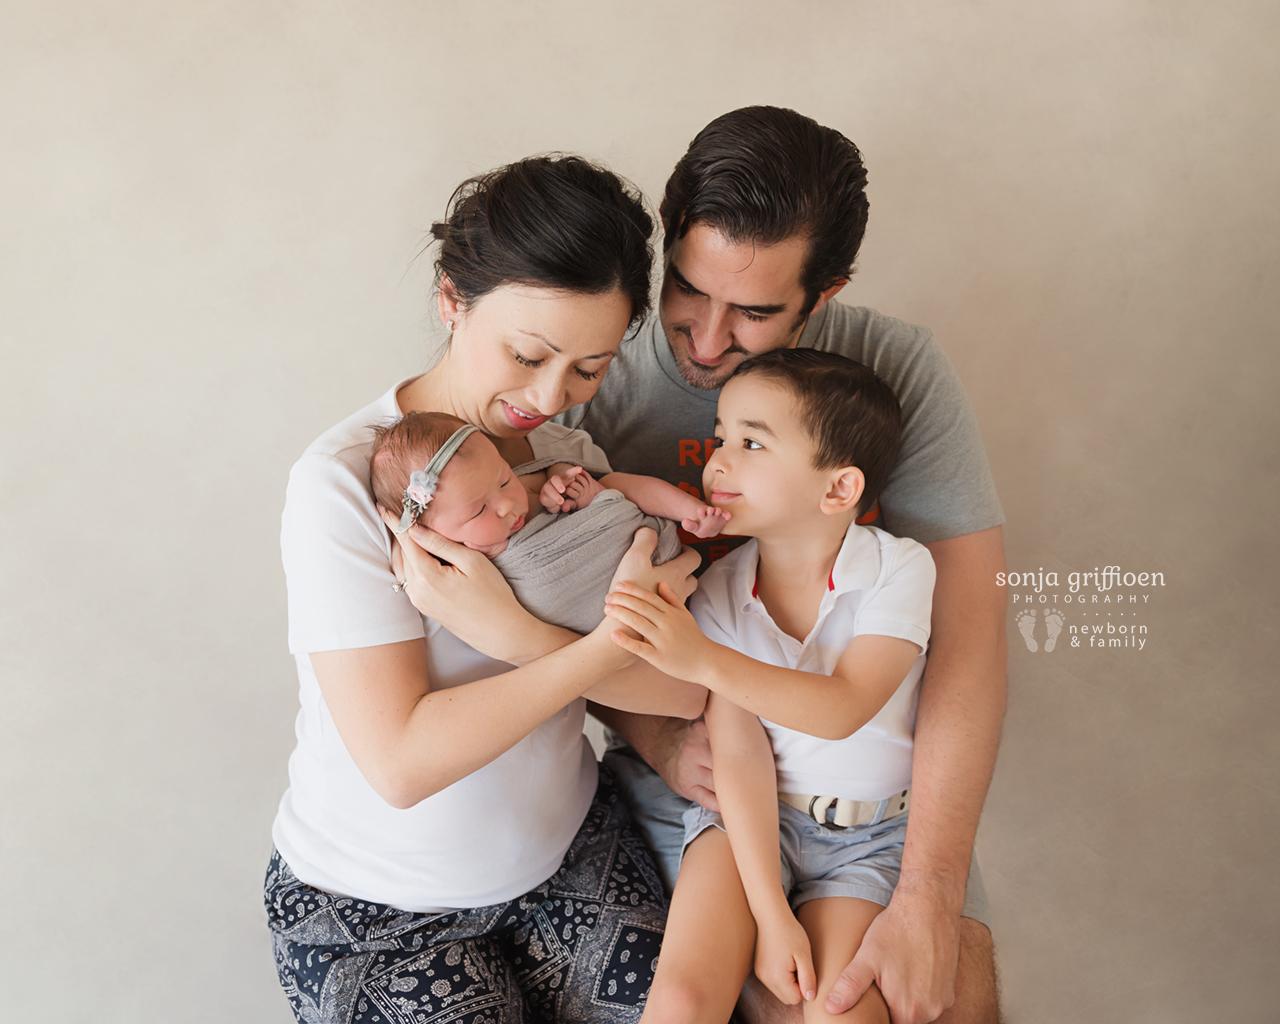 Estella-Newborn-Brisbane-Newborn-Photographer-Sonja-Griffioen-09.jpg